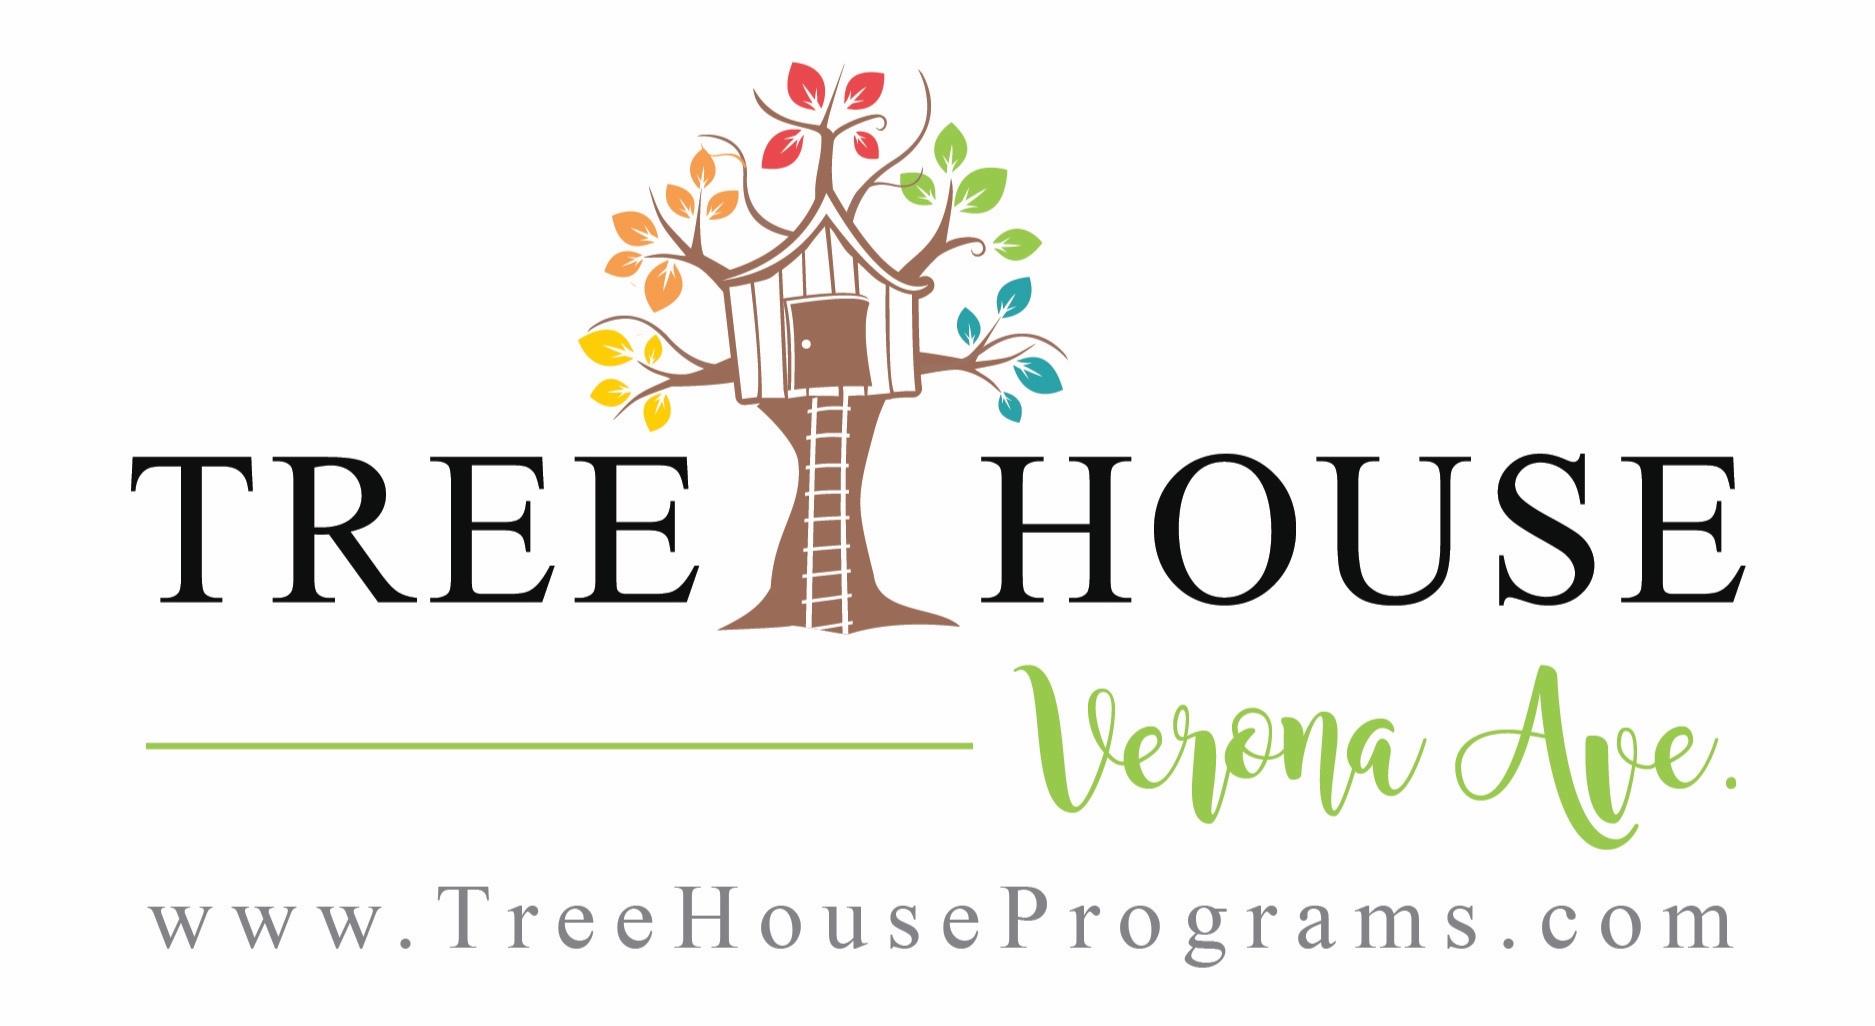 treehouse-logos-4-02.jpg